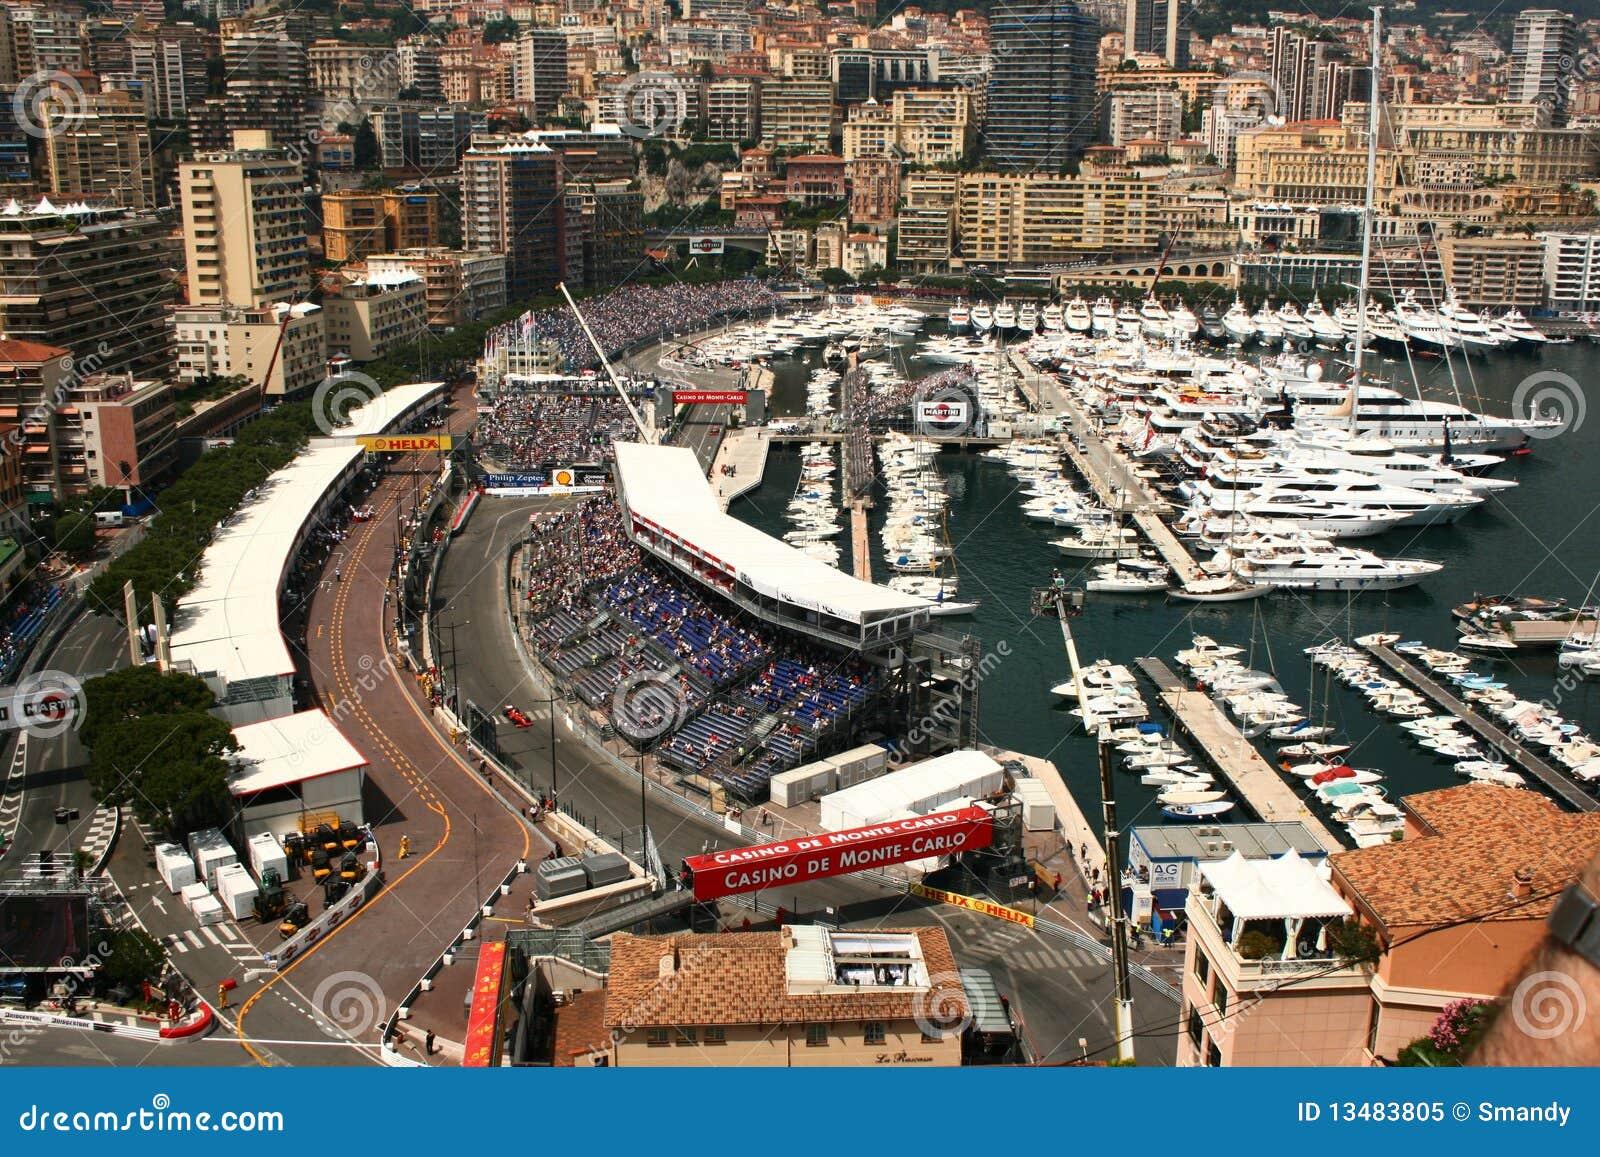 Circuito Monaco : Monaco palace stock image image of monte beach gulf